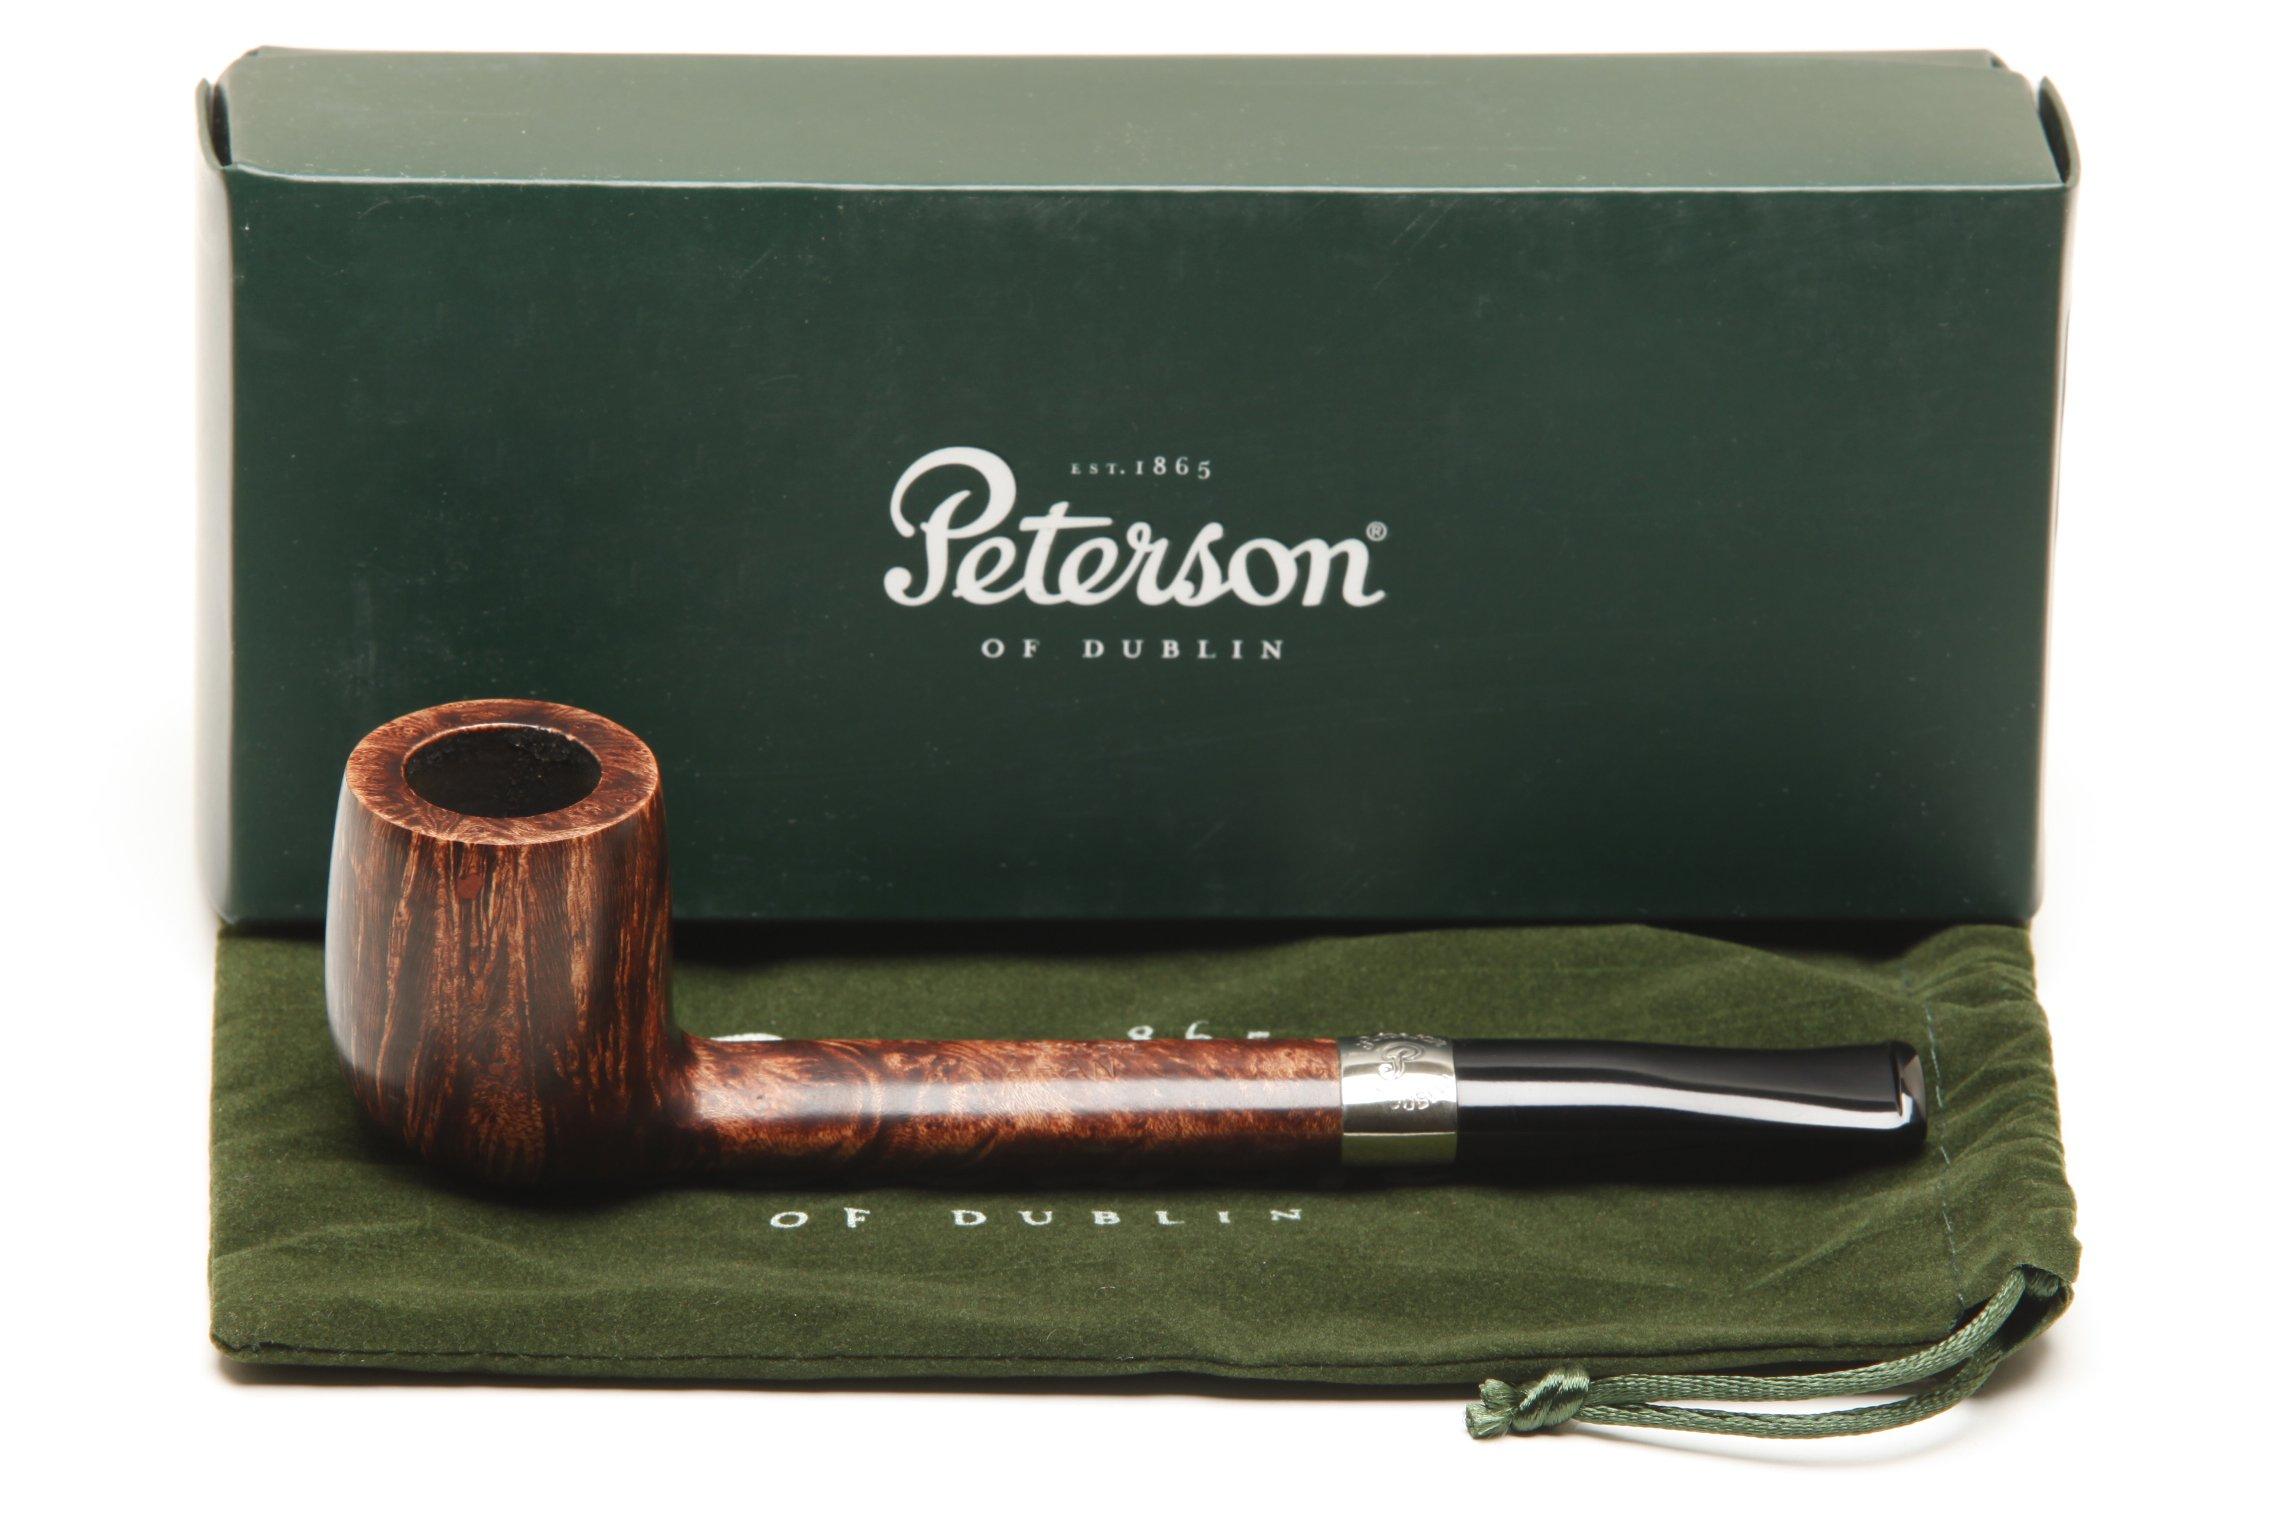 Peterson Aran 264 Nickel Band Tobacco Pipe Fishtail